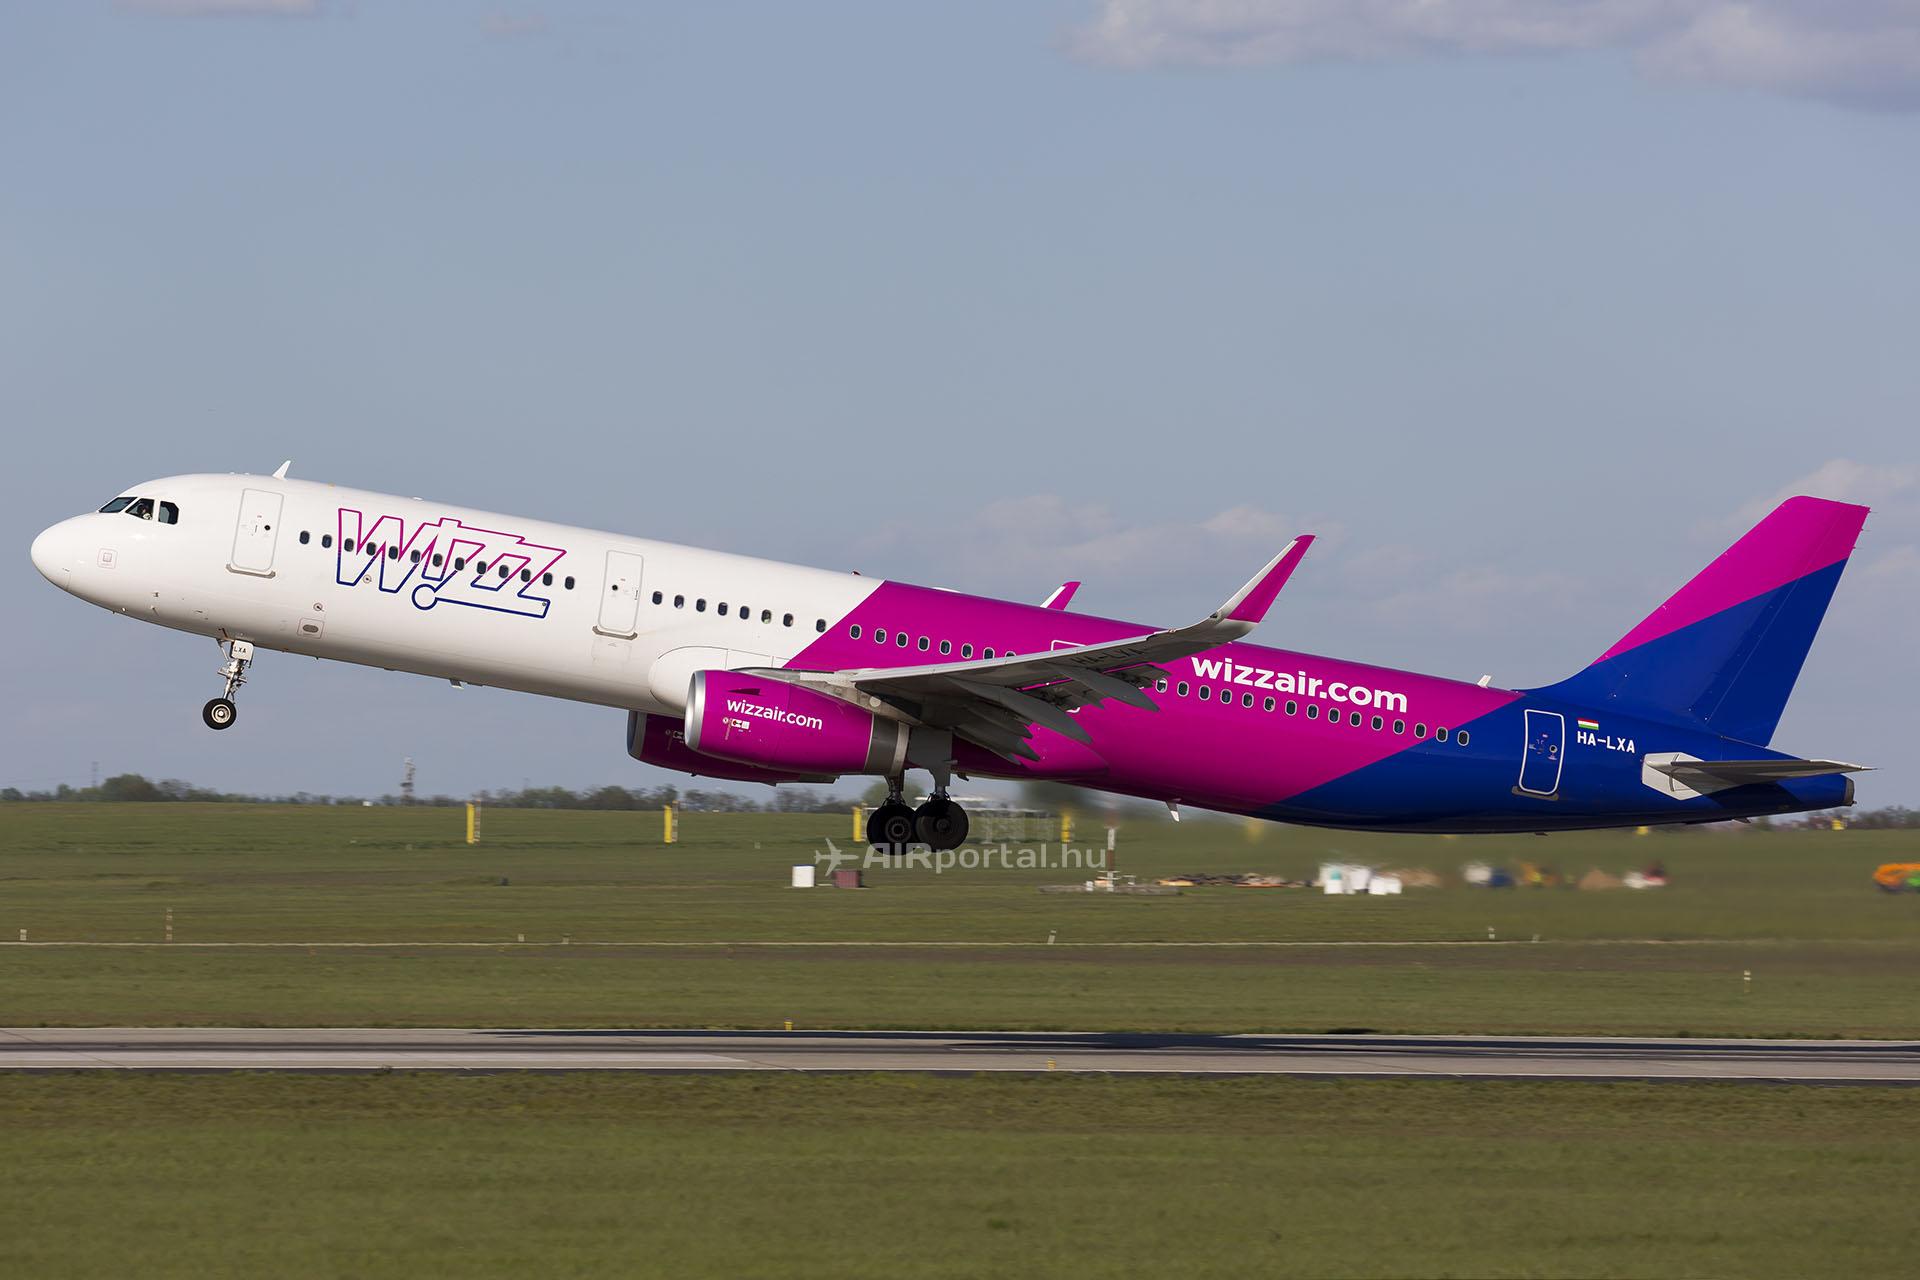 A Wizz Air Airbus A321-es repülőgépe. (Fotó: AIRportal.hu) | © AIRportal.hu